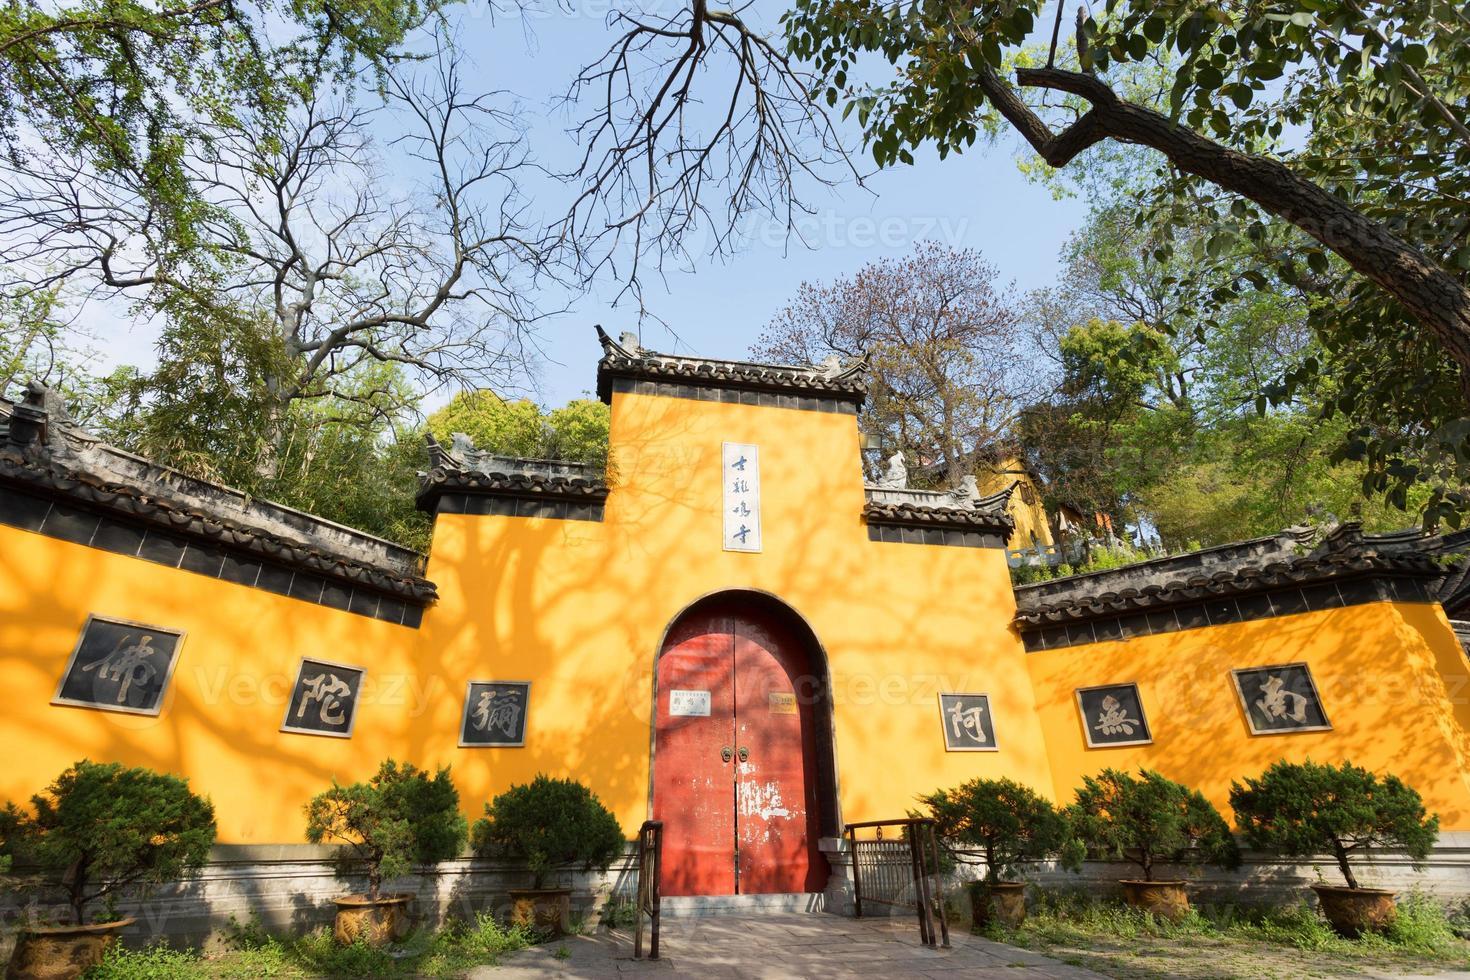 Haupteingang des Jiming-Tempels, Nanjing, Provinz Jiangsu, China. foto